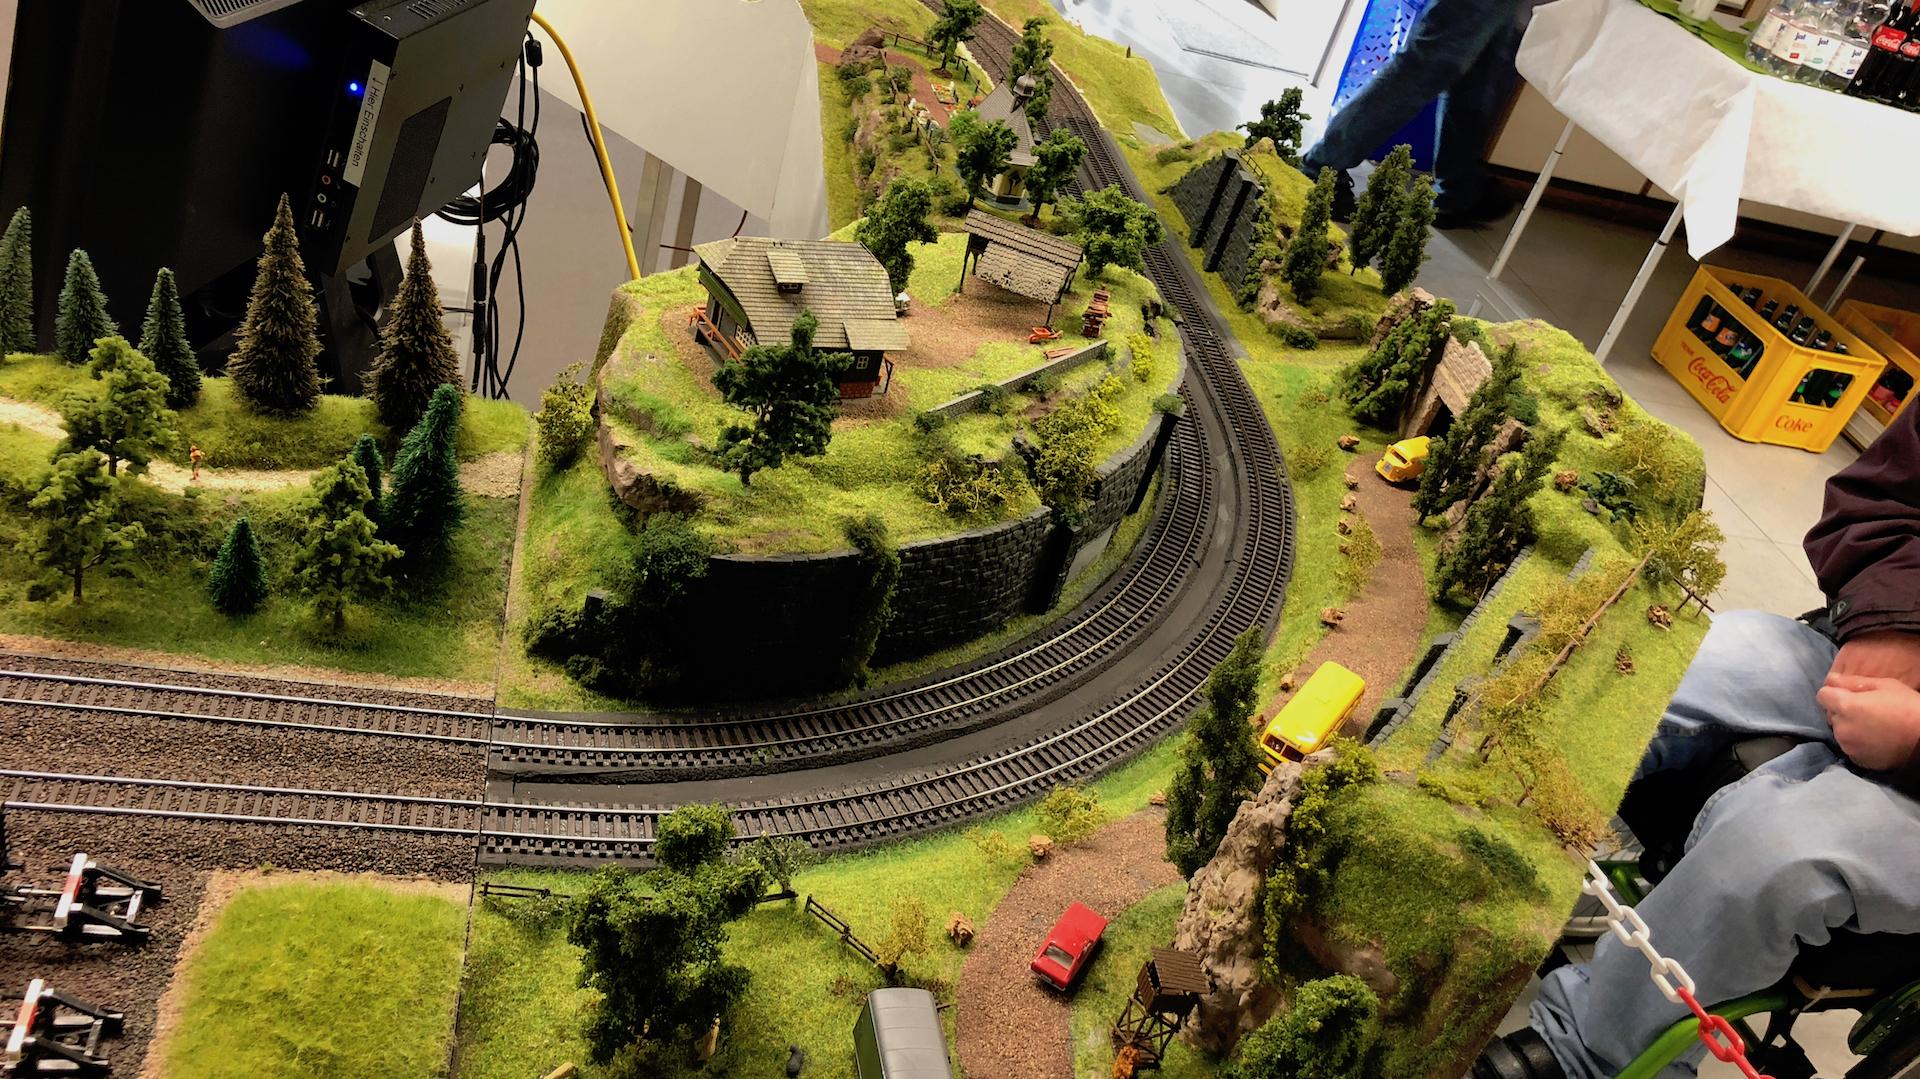 18_02_24_Schautag-Eisenbahnfreunde-Hameln_028